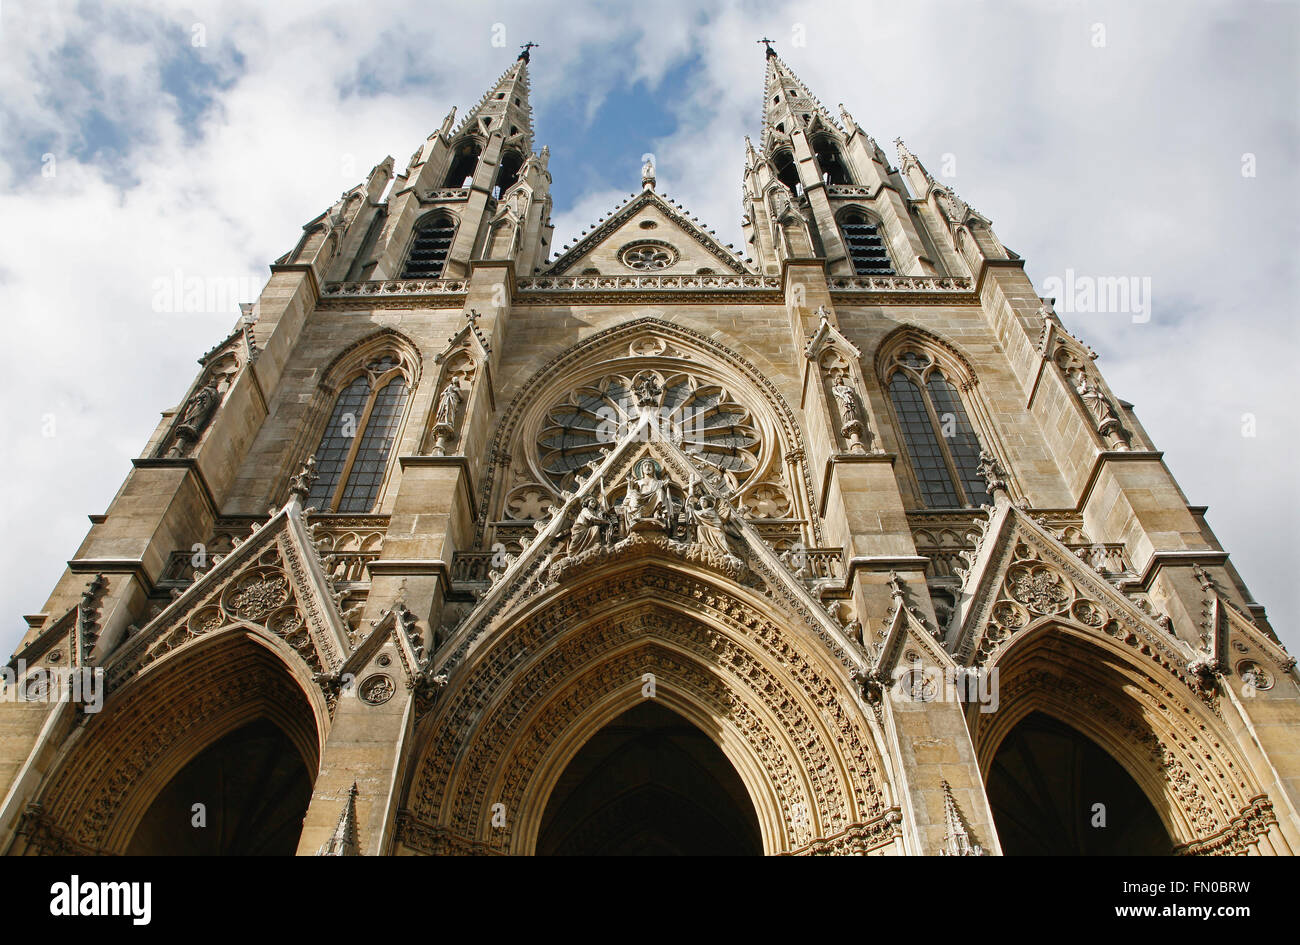 Paris - facade of Saint Clotilde gothic church - Stock Image